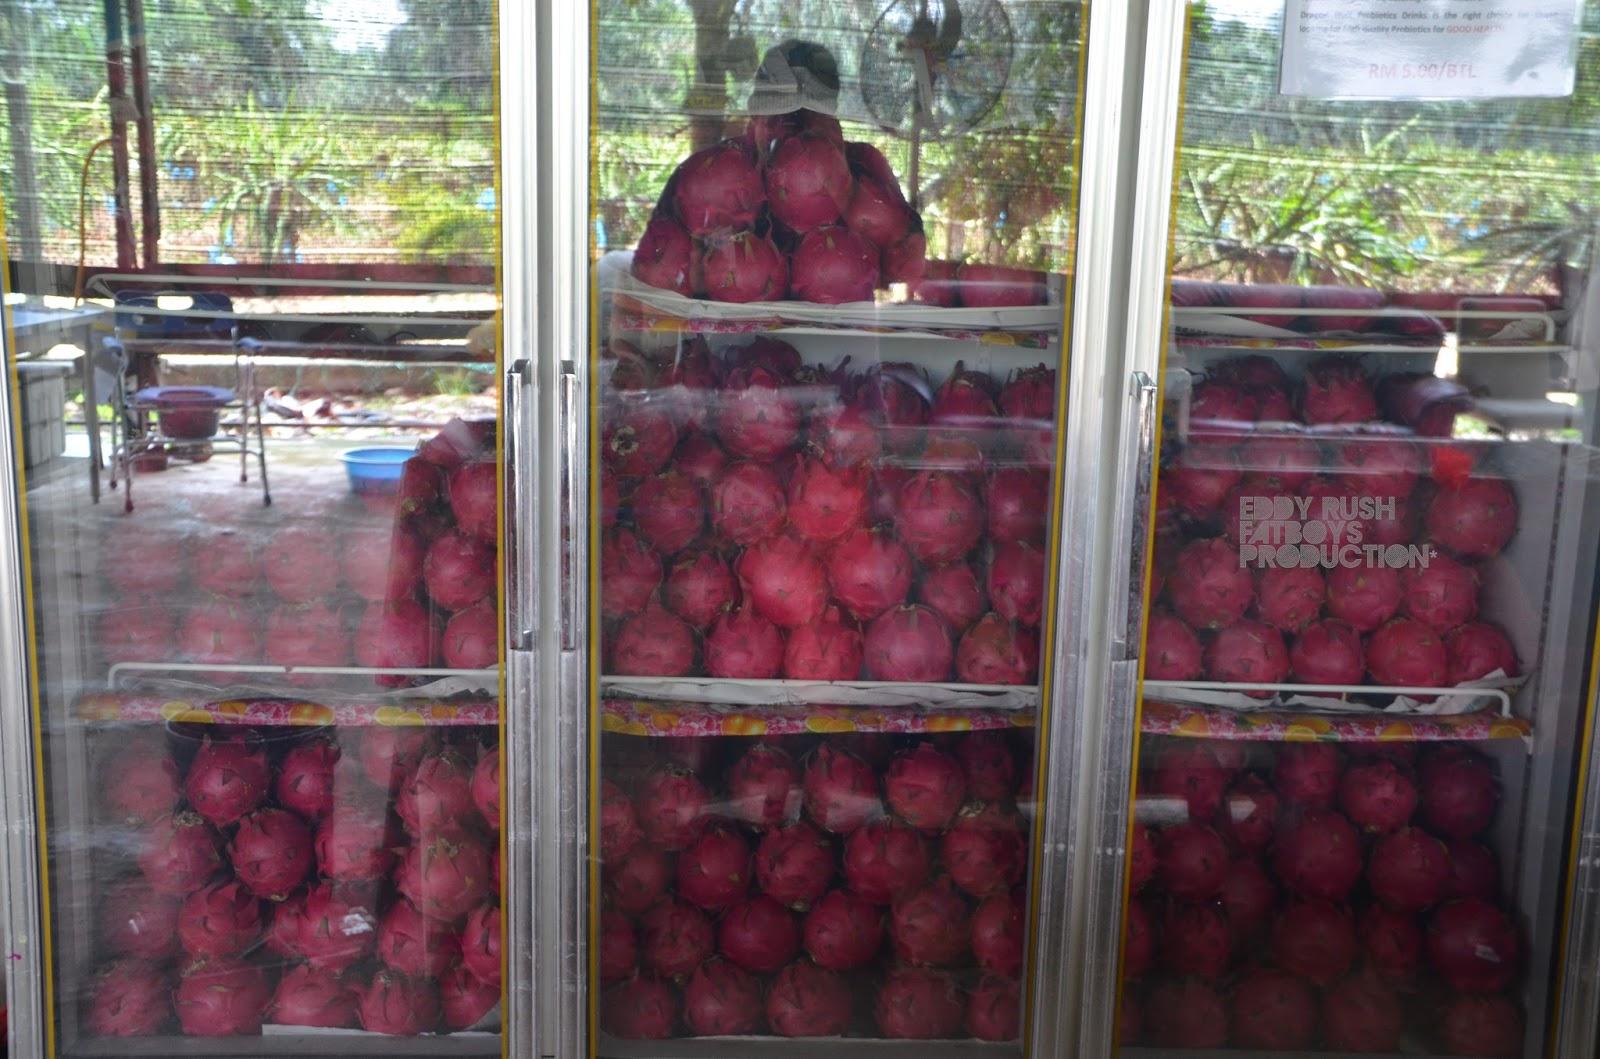 Dragon fruit farm sepang golden unigen life sciences anavar oxandrolone